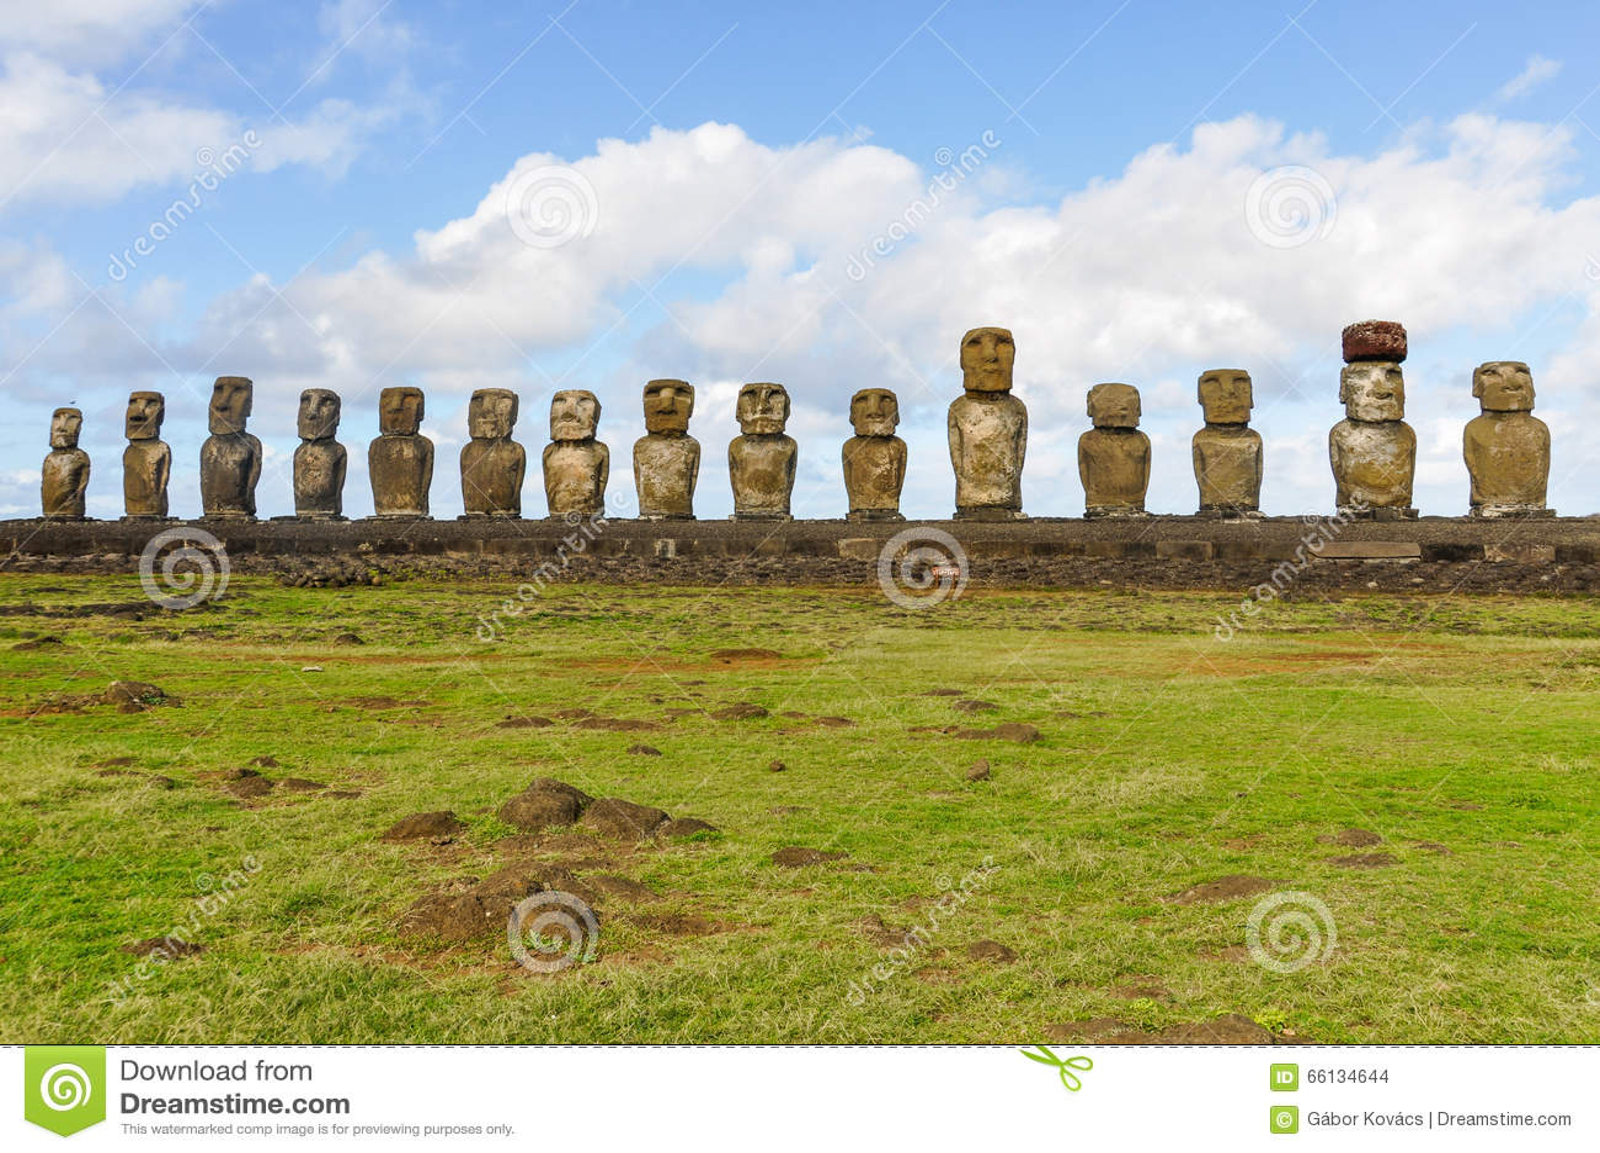 Moai On Ahu Tongariki Easter Island Chile Stock Photo